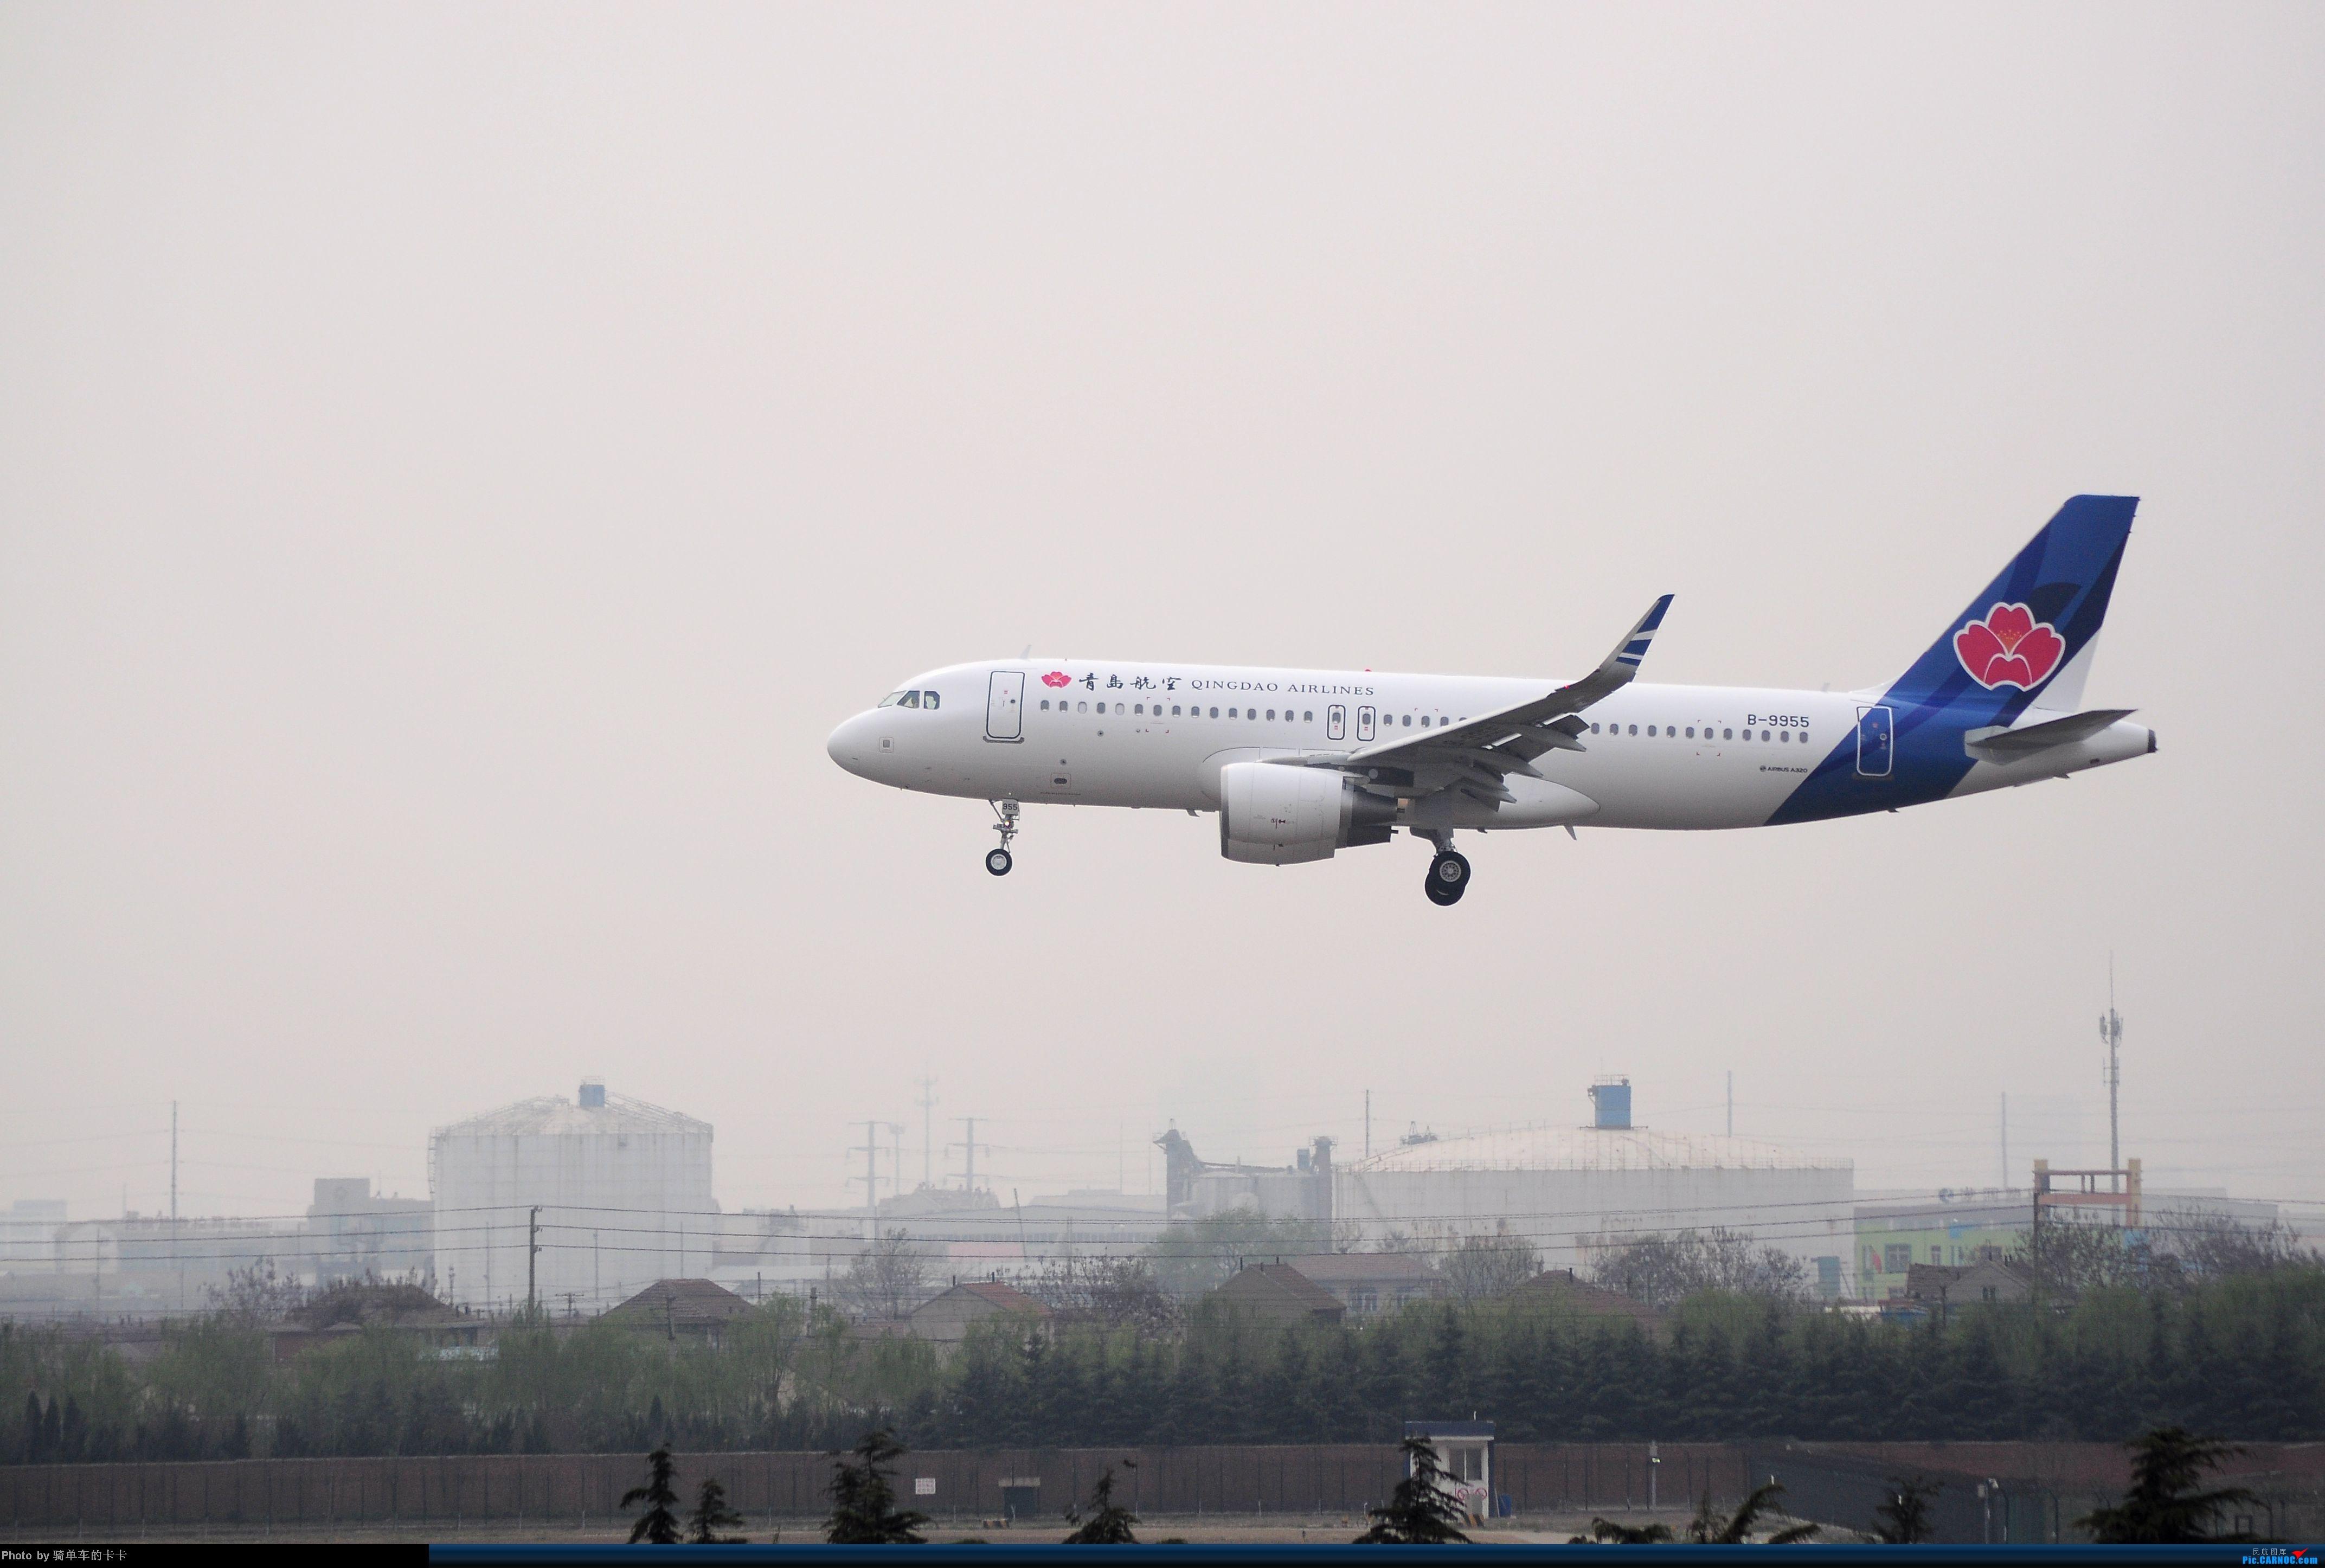 re:青岛航空首架飞机降落青岛流亭国际机场